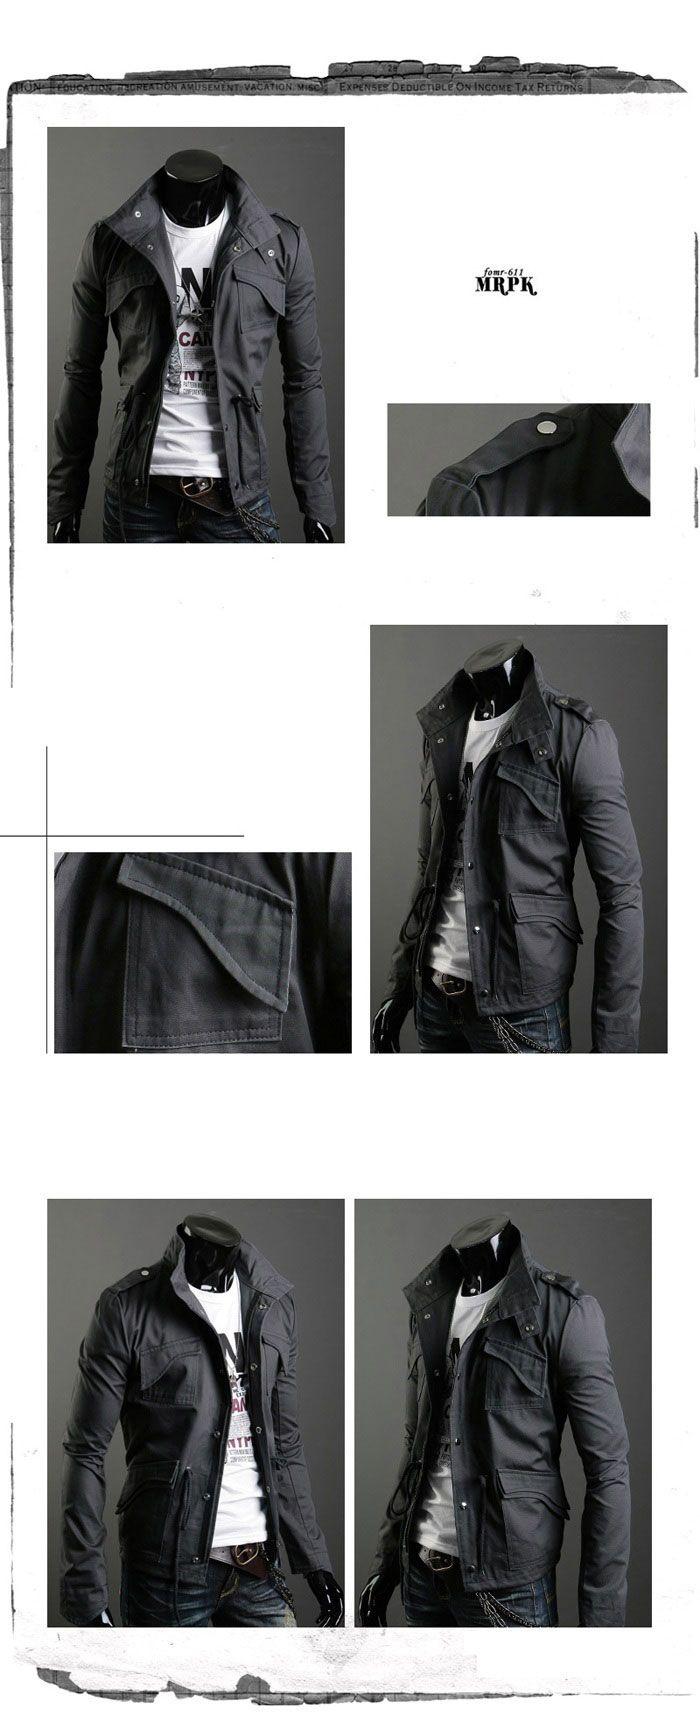 15 Best Th Cn Mua Images On Pinterest Henley Shirts Menswear Kemeja Flanel Pria Model Slimfit Modern Dark Arthur New Style Pockets Slim Fit Jacket Awesome